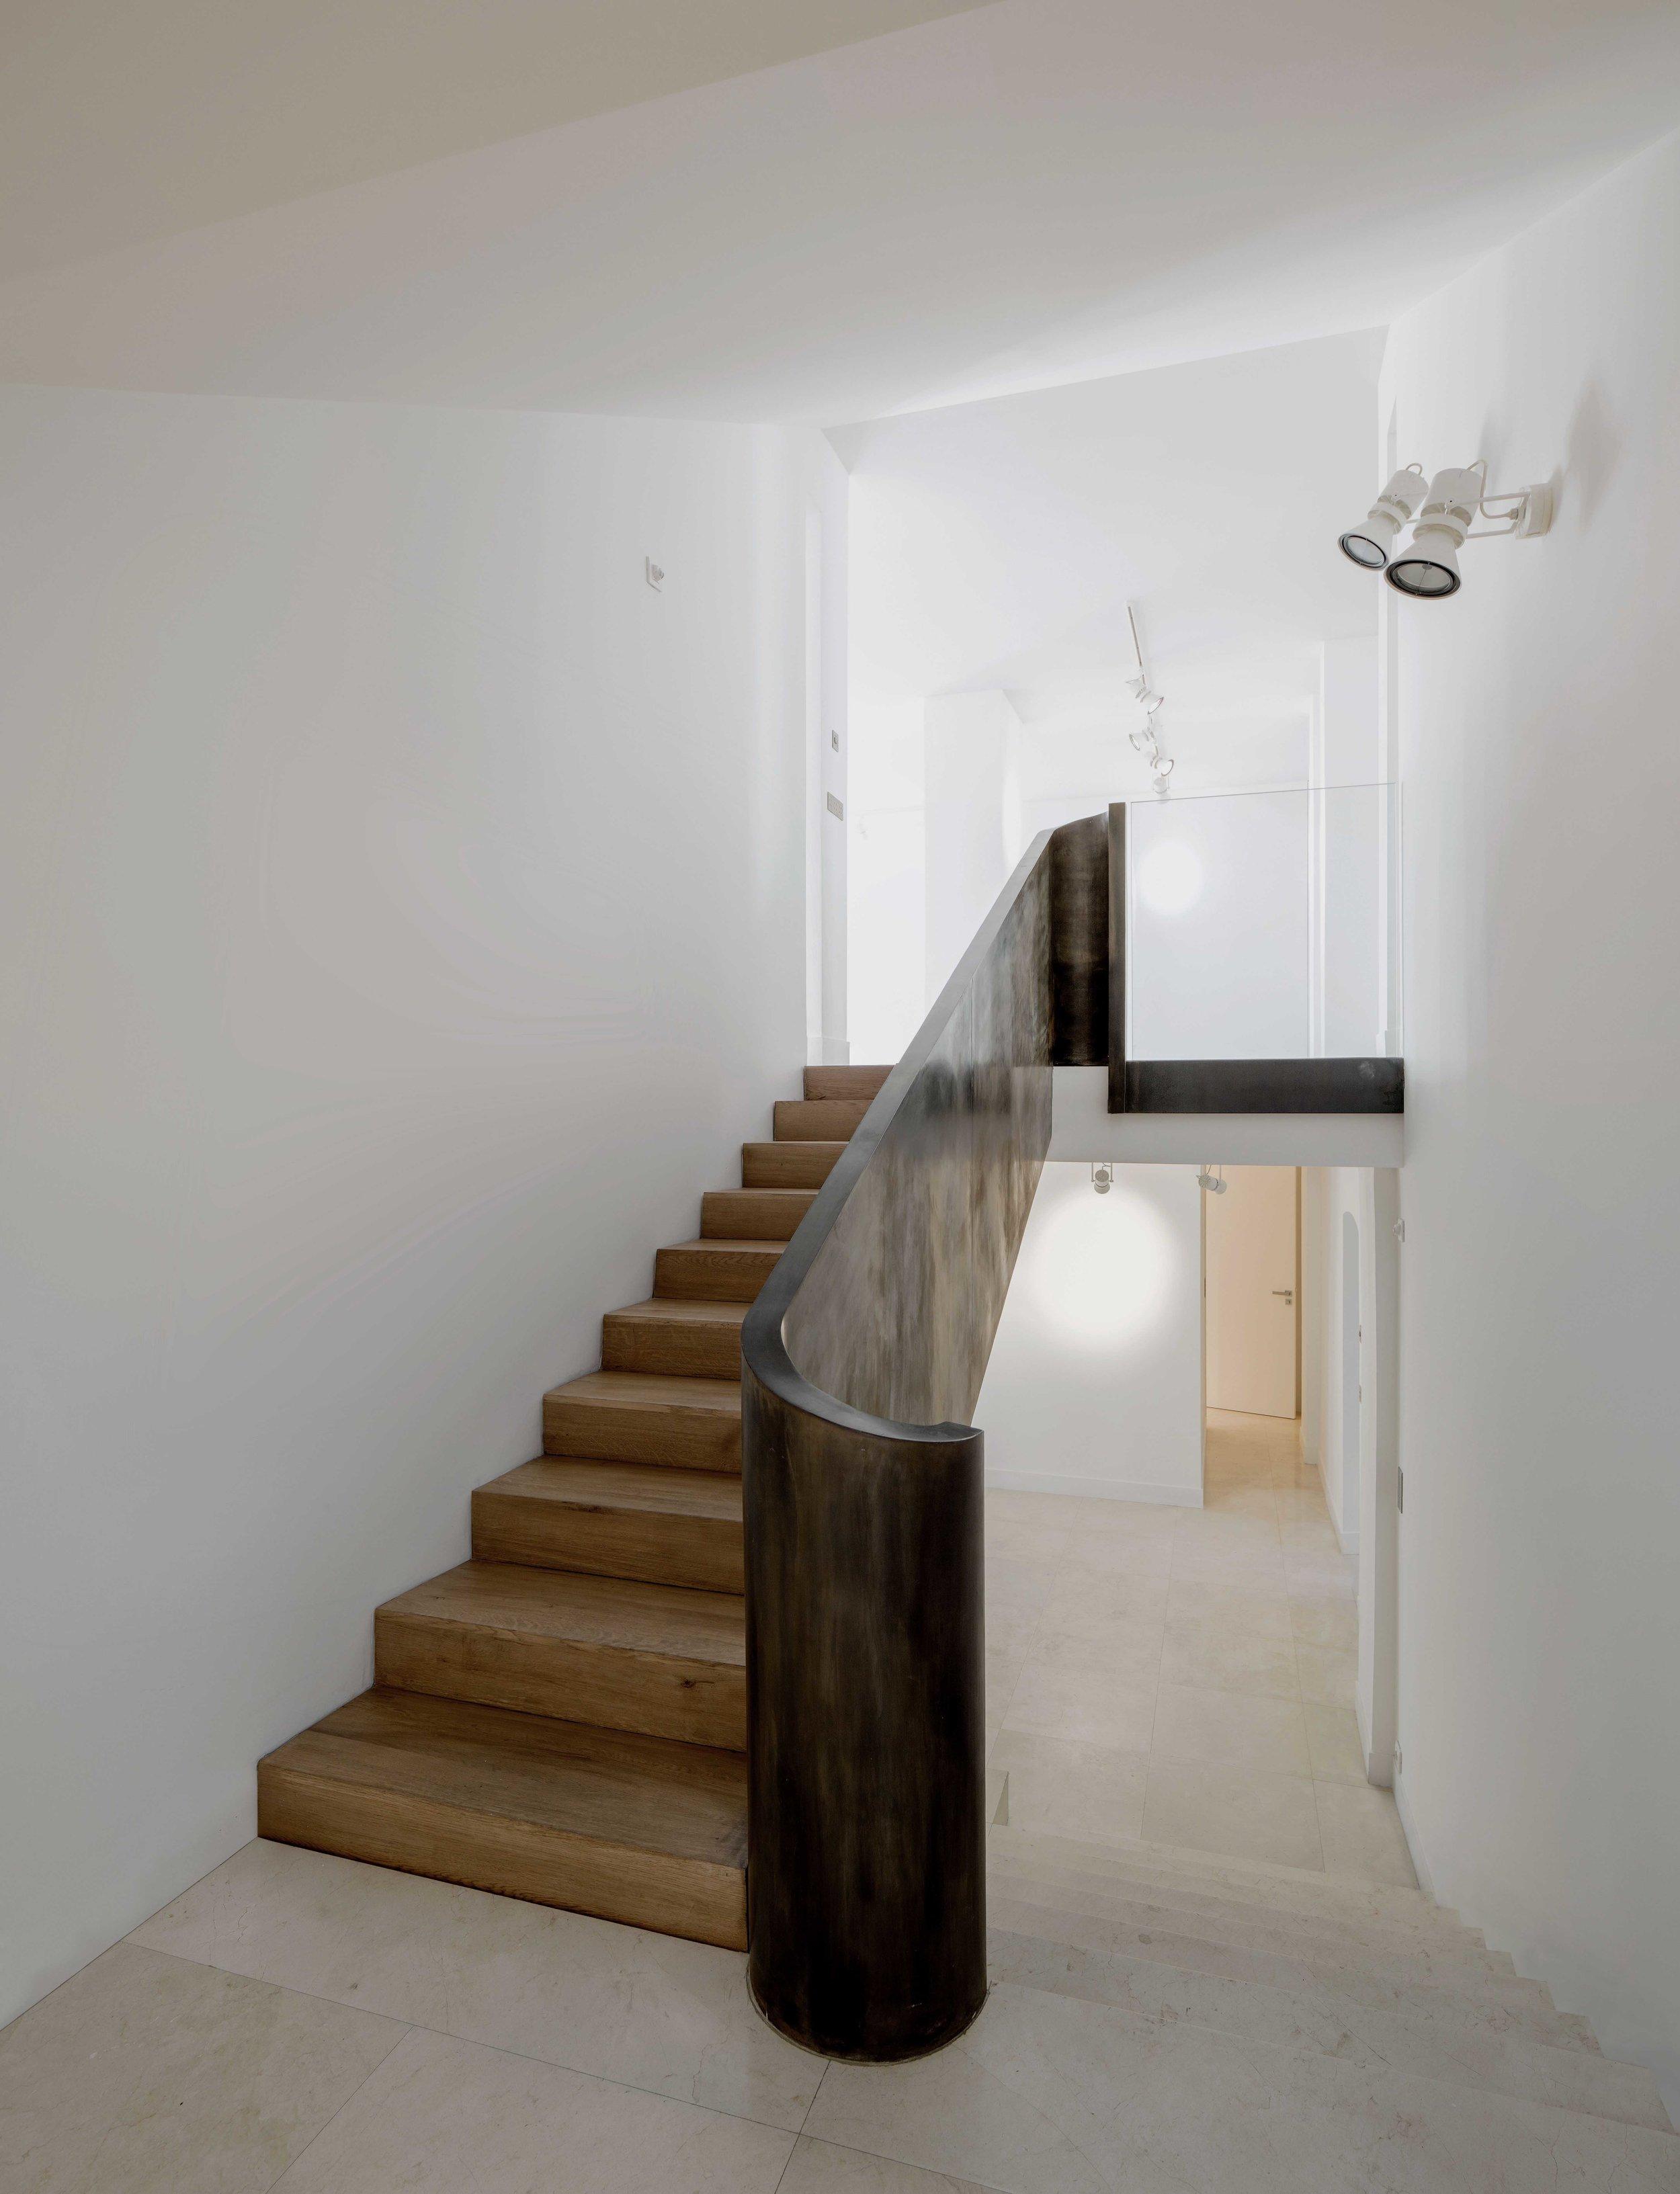 escalier interieur 2-qualité moyen.jpg